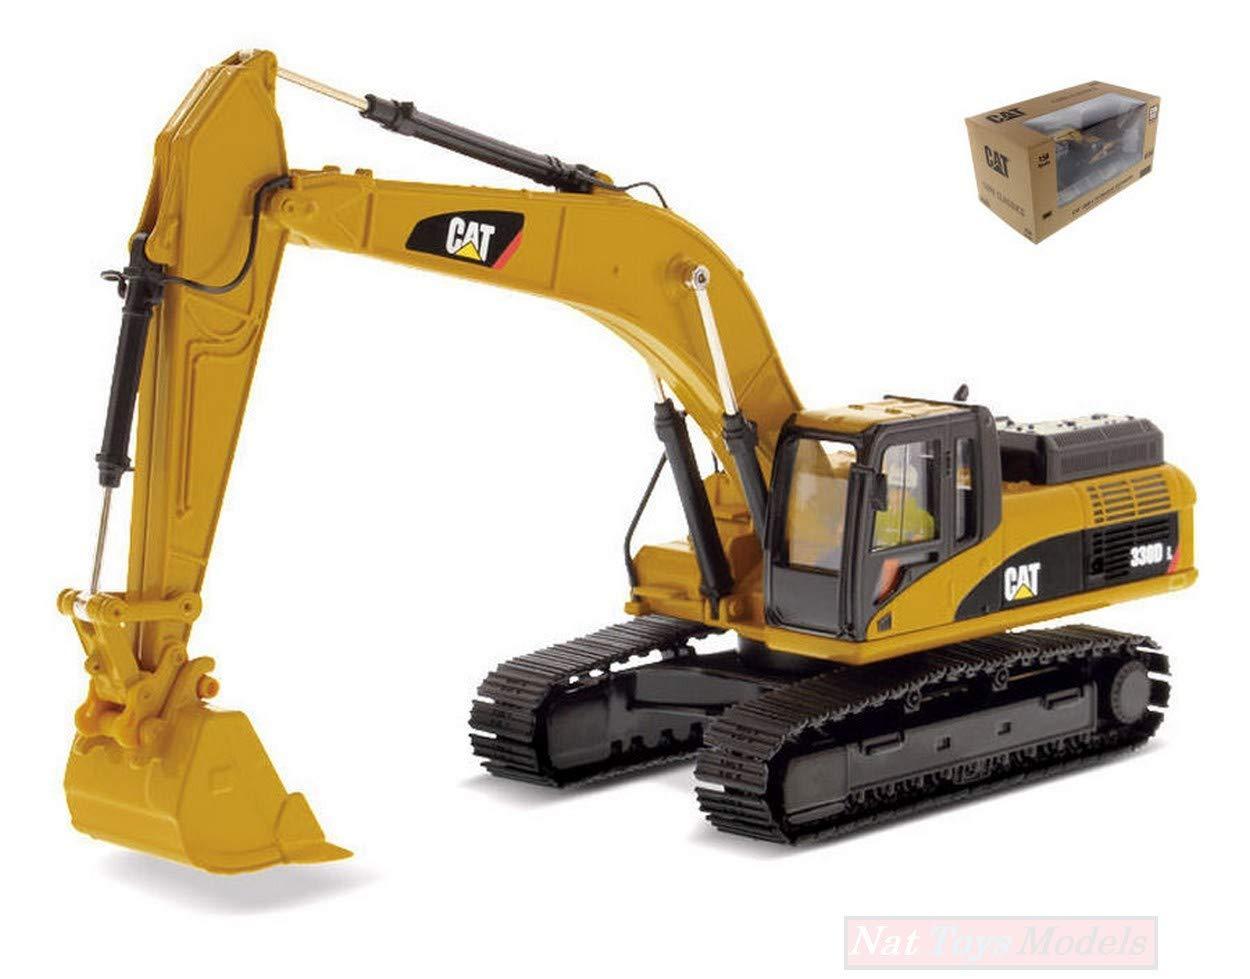 venta caliente NEW DIECAST Master Master Master DM85199 Cat 330D L Hydraulic Excavator 1 50 MODELLINO Die Cast  ahorra hasta un 70%